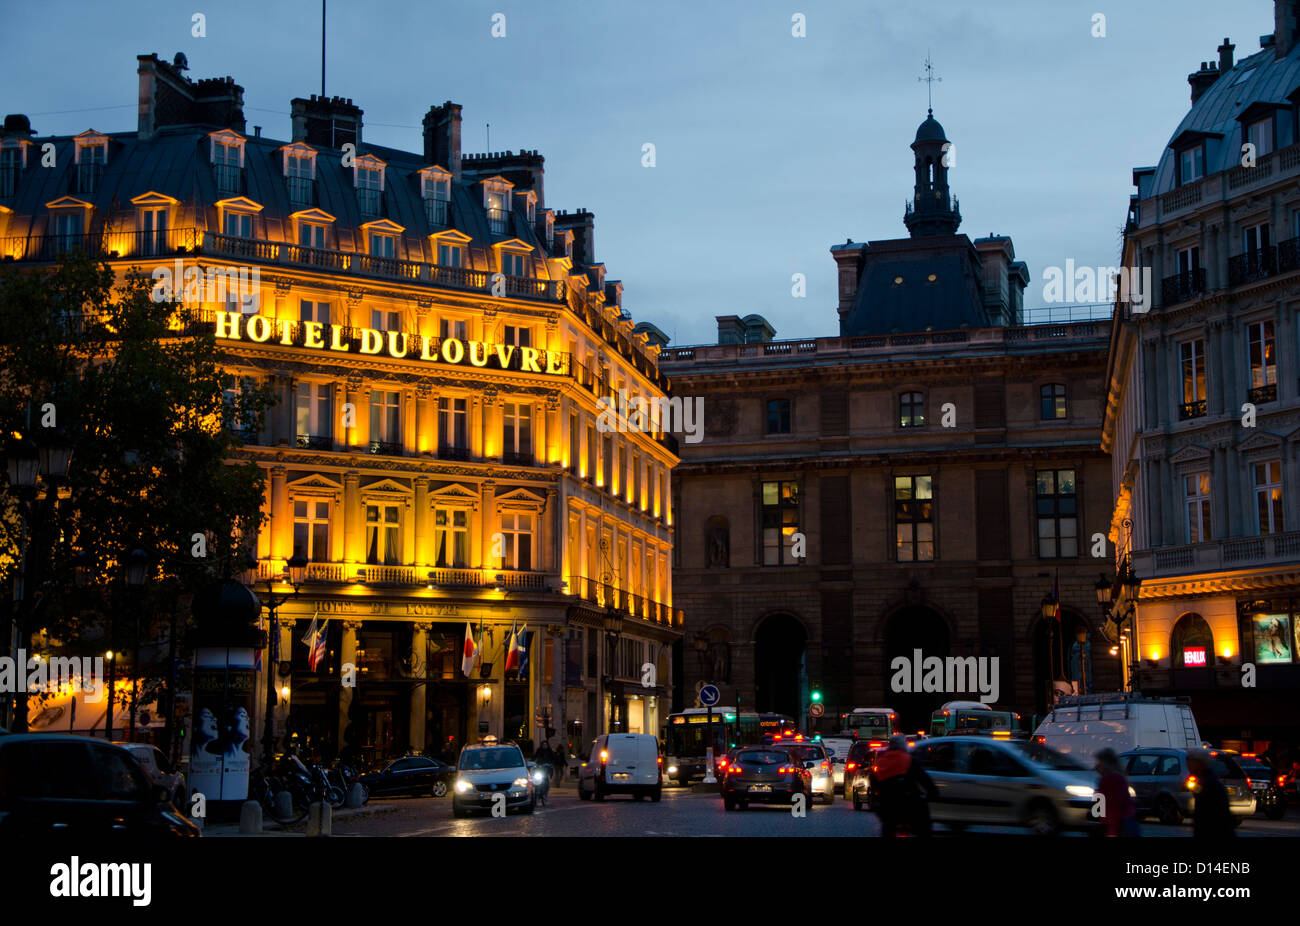 grand hotel du louvre at place du palais royal at night paris stock photo 52345143 alamy. Black Bedroom Furniture Sets. Home Design Ideas